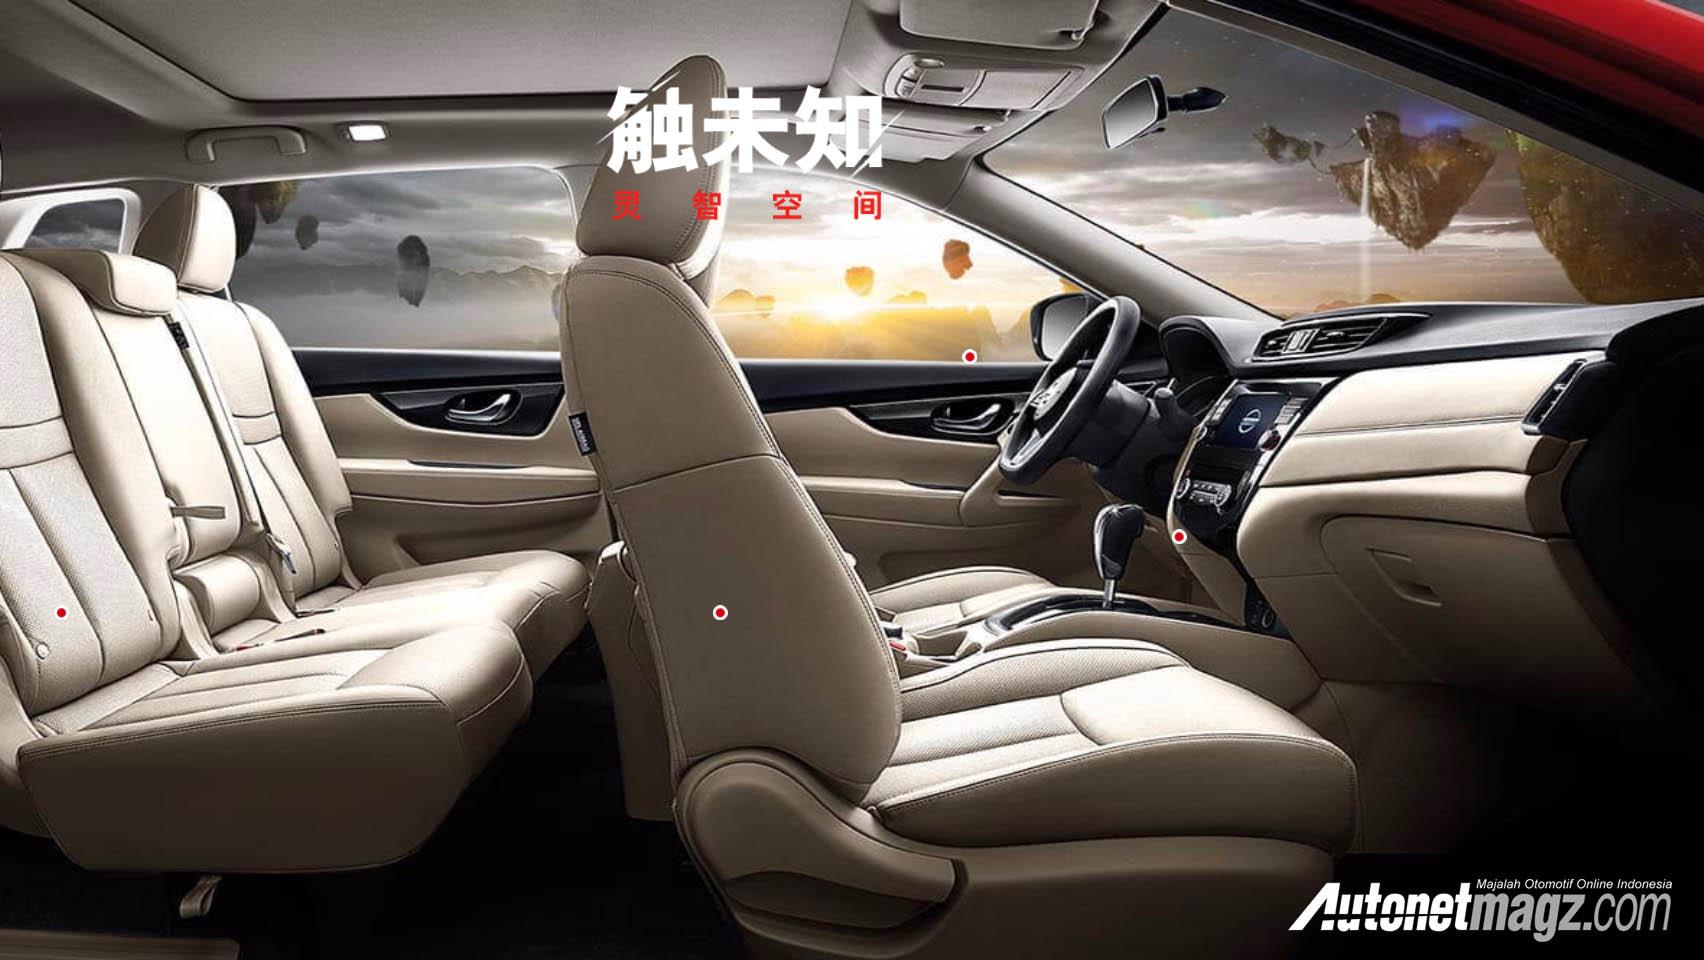 Interior nissan xtrail t32 facelift autonetmagz for Nissan x trail interior